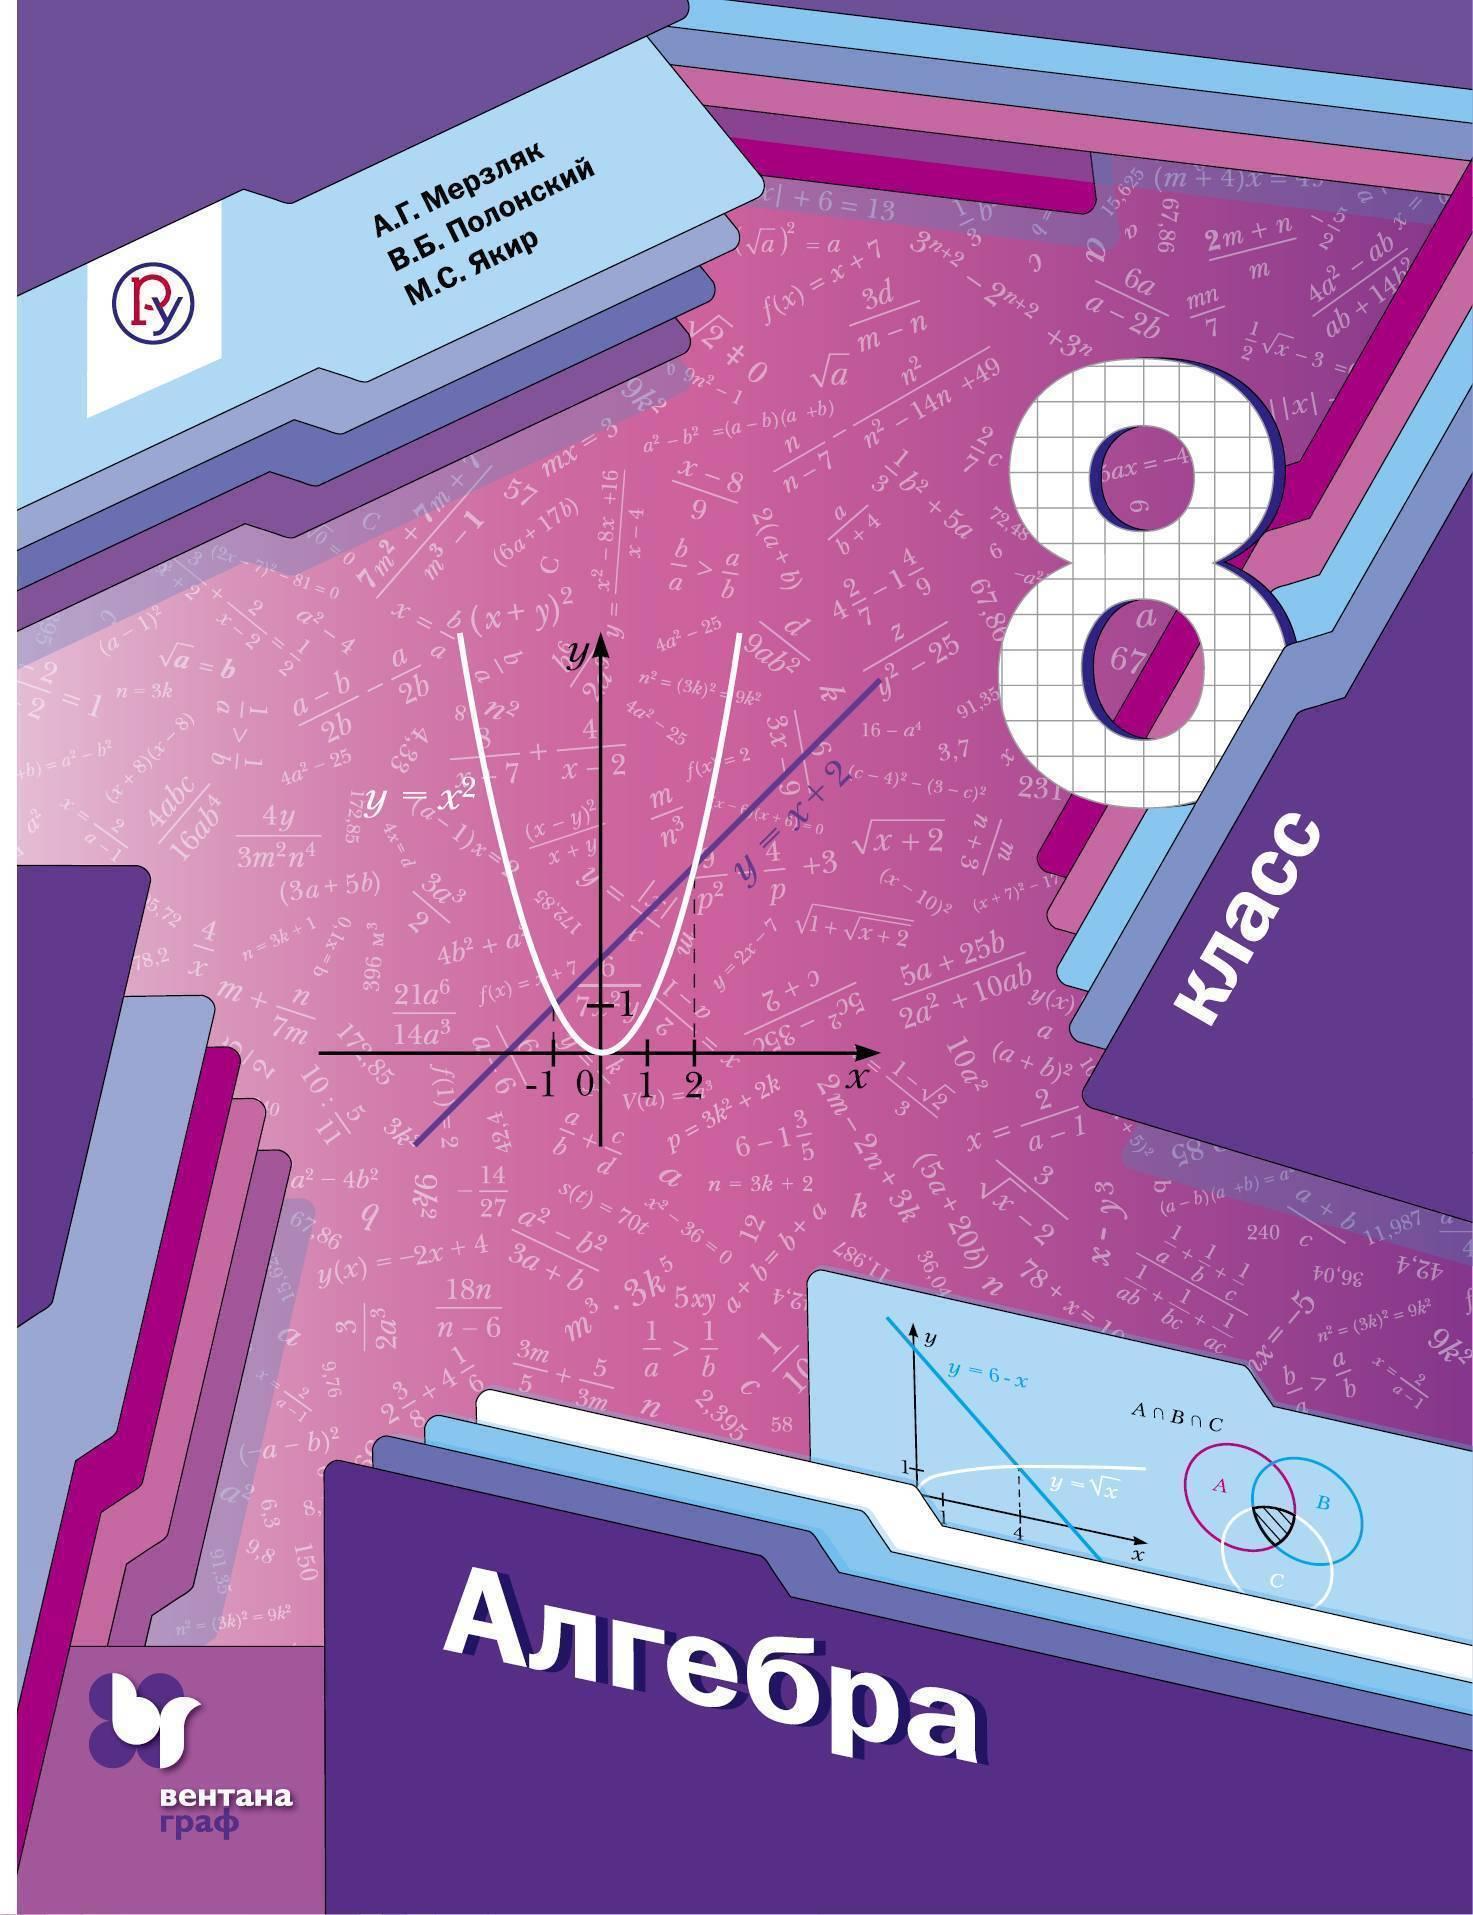 Алгебра. 8 класс. Учебник - Мерзляк, Полонский, Якир